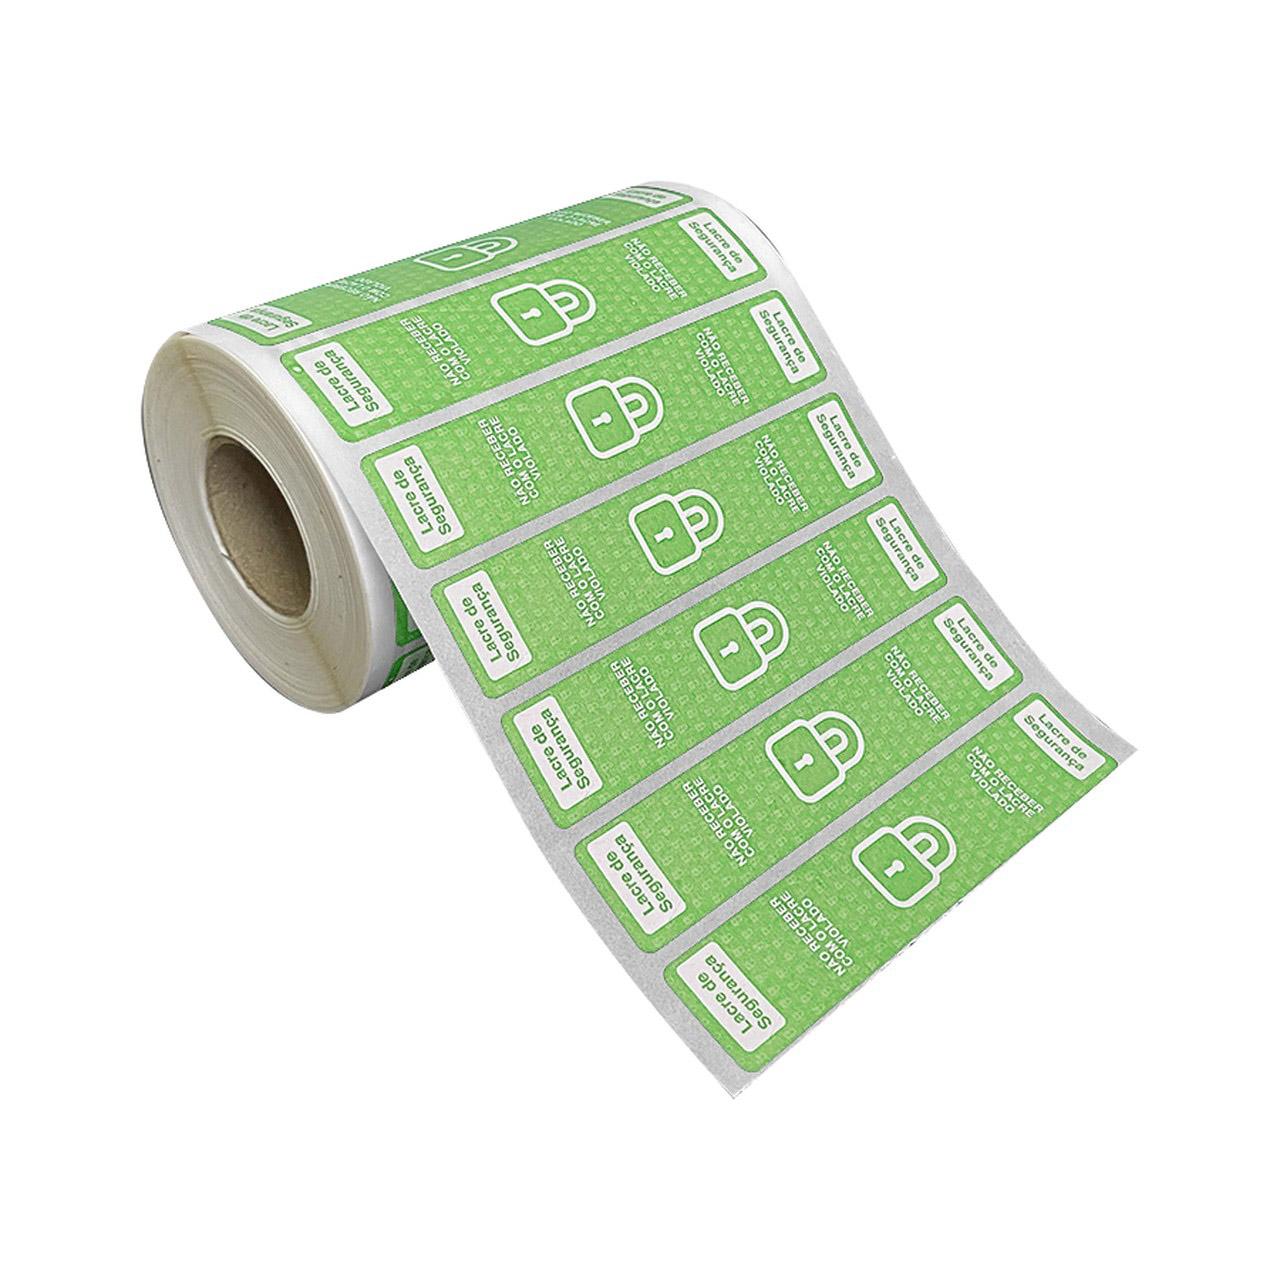 Etiquetas Adesivas Lacre Segurança Delivery iFood Alimentos Verde  - Etiqueta Certa